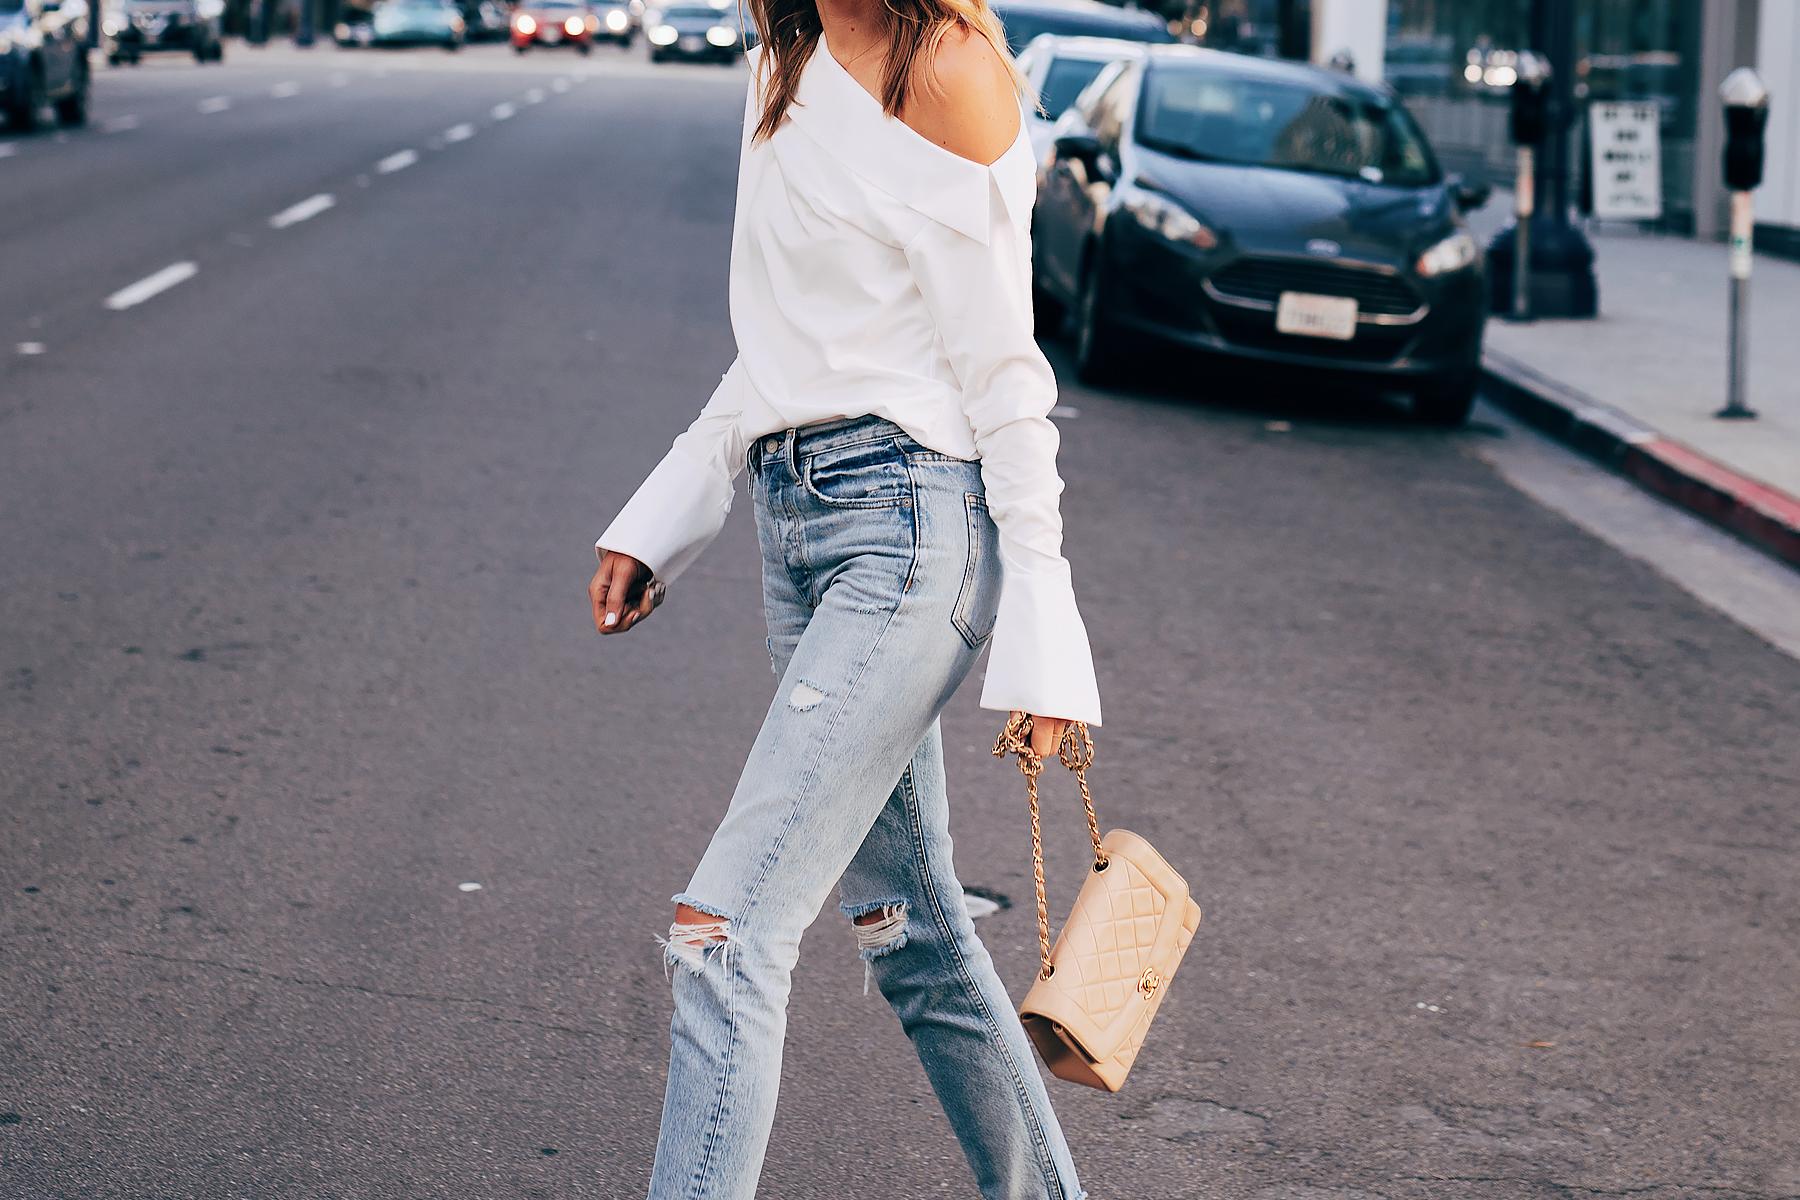 Woman Wearing Jing White off the Shoulder Top Denim Ripped Jeans Tan Handbag Fashion Jackson San Diego Fashion Blogger Street Style